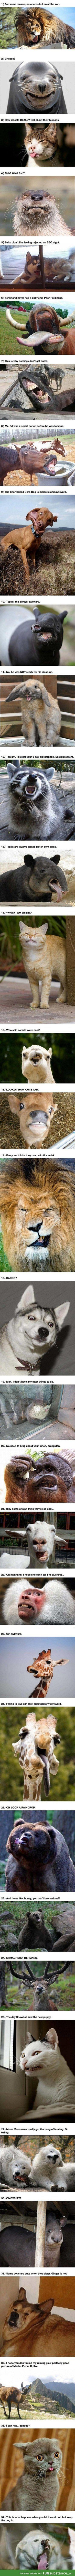 34 not so photogenic animals